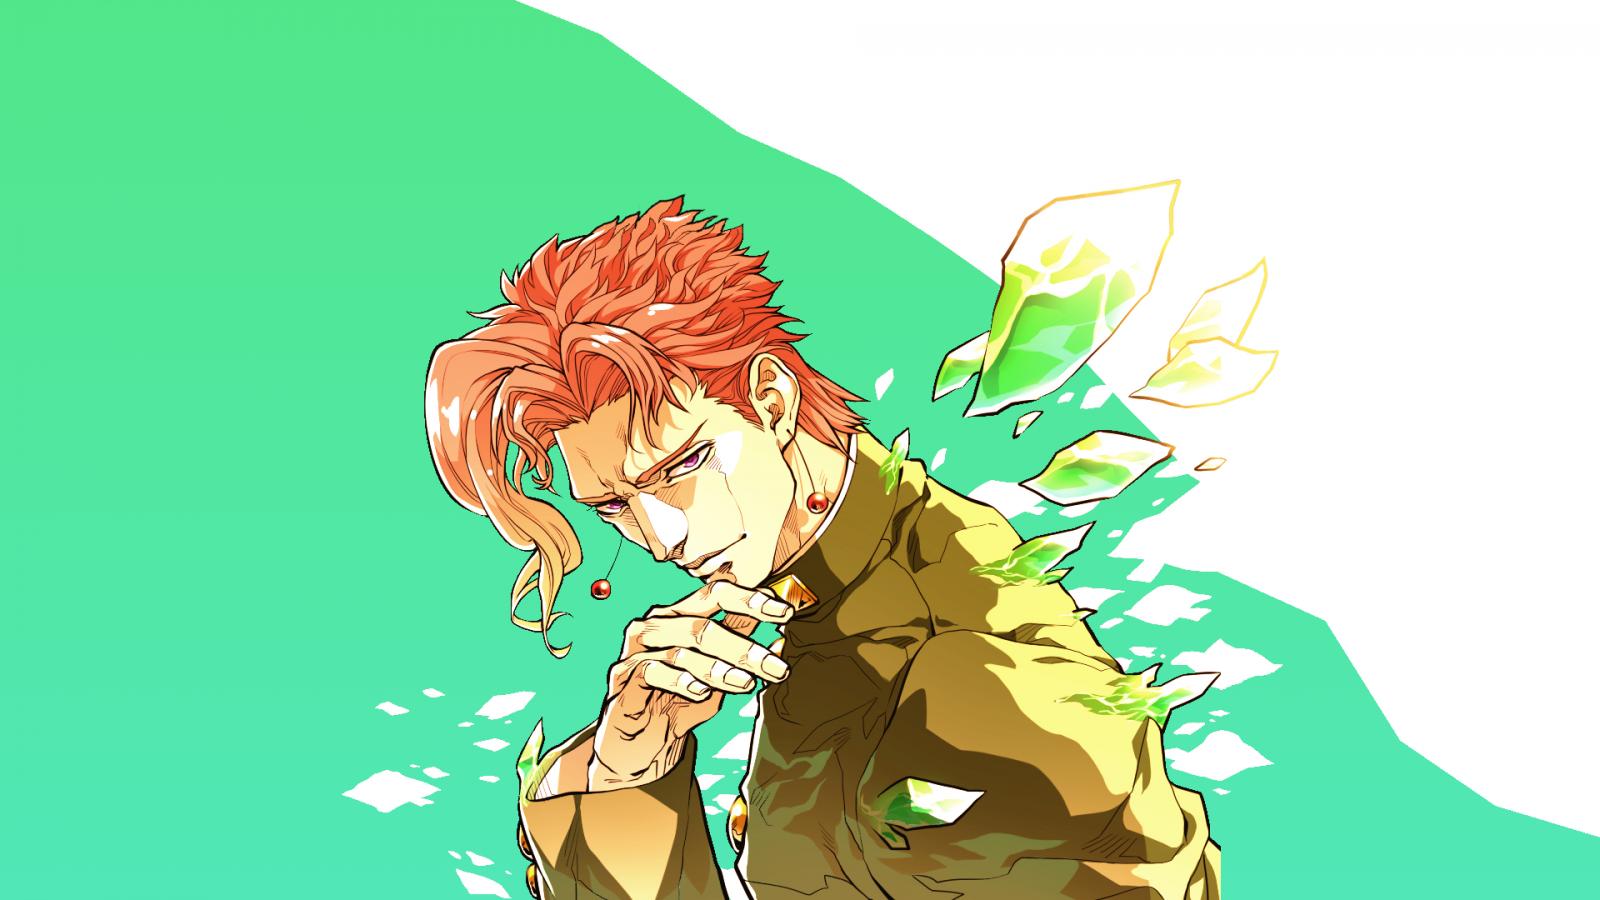 Fond D'écran : Illustration, Roux, Anime, Dessin Animé